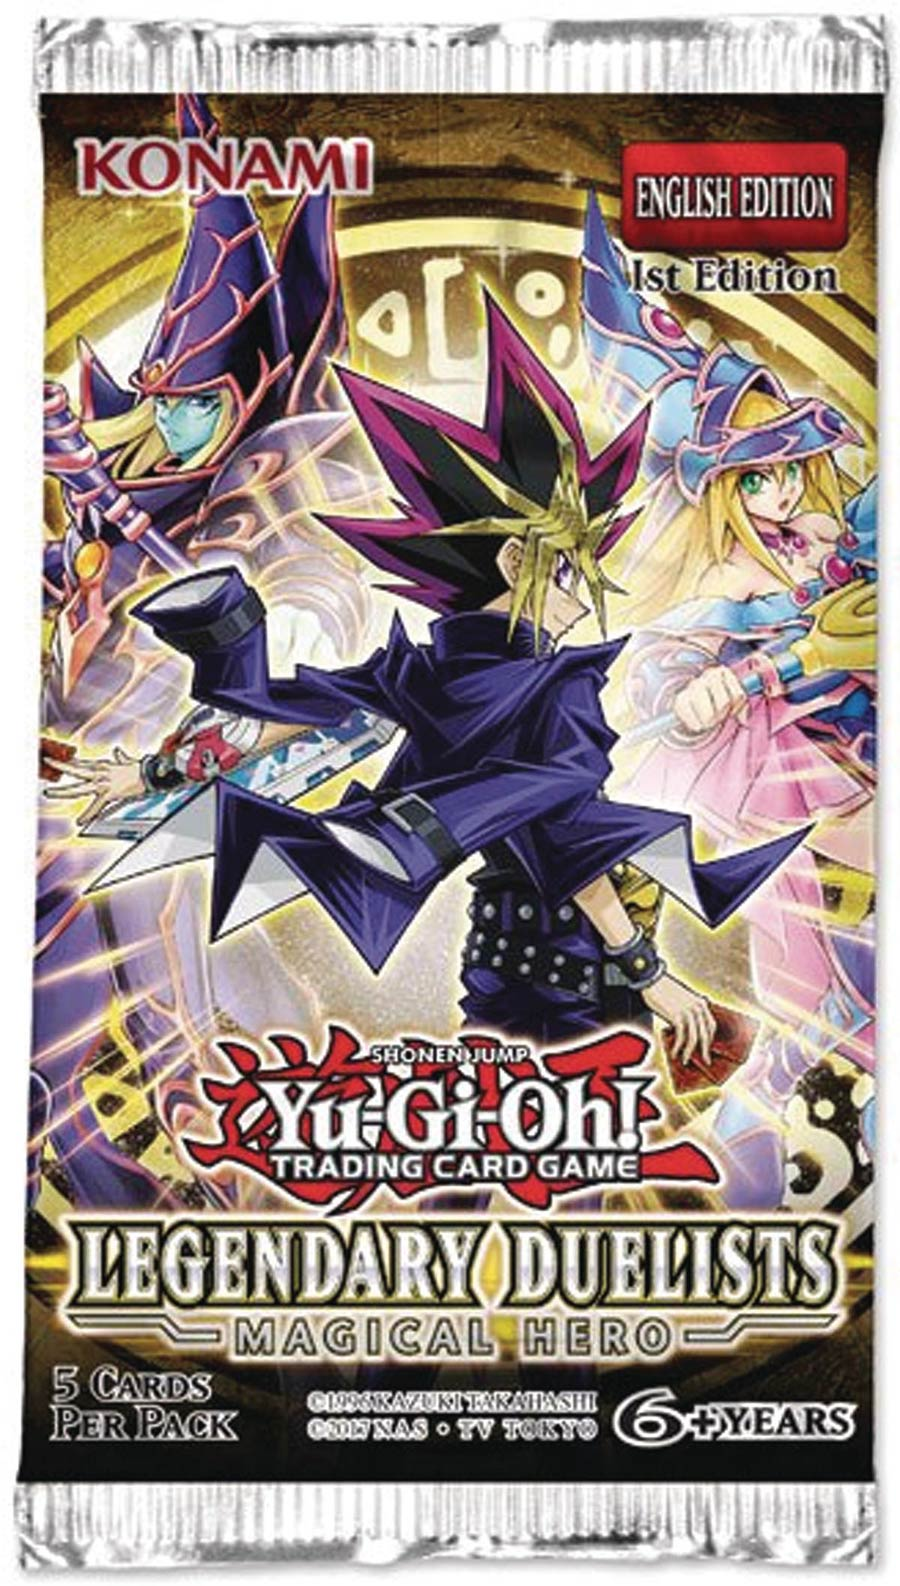 Yu-Gi-Oh Legendary Duelist Immortal Magical Hero Booster Pack